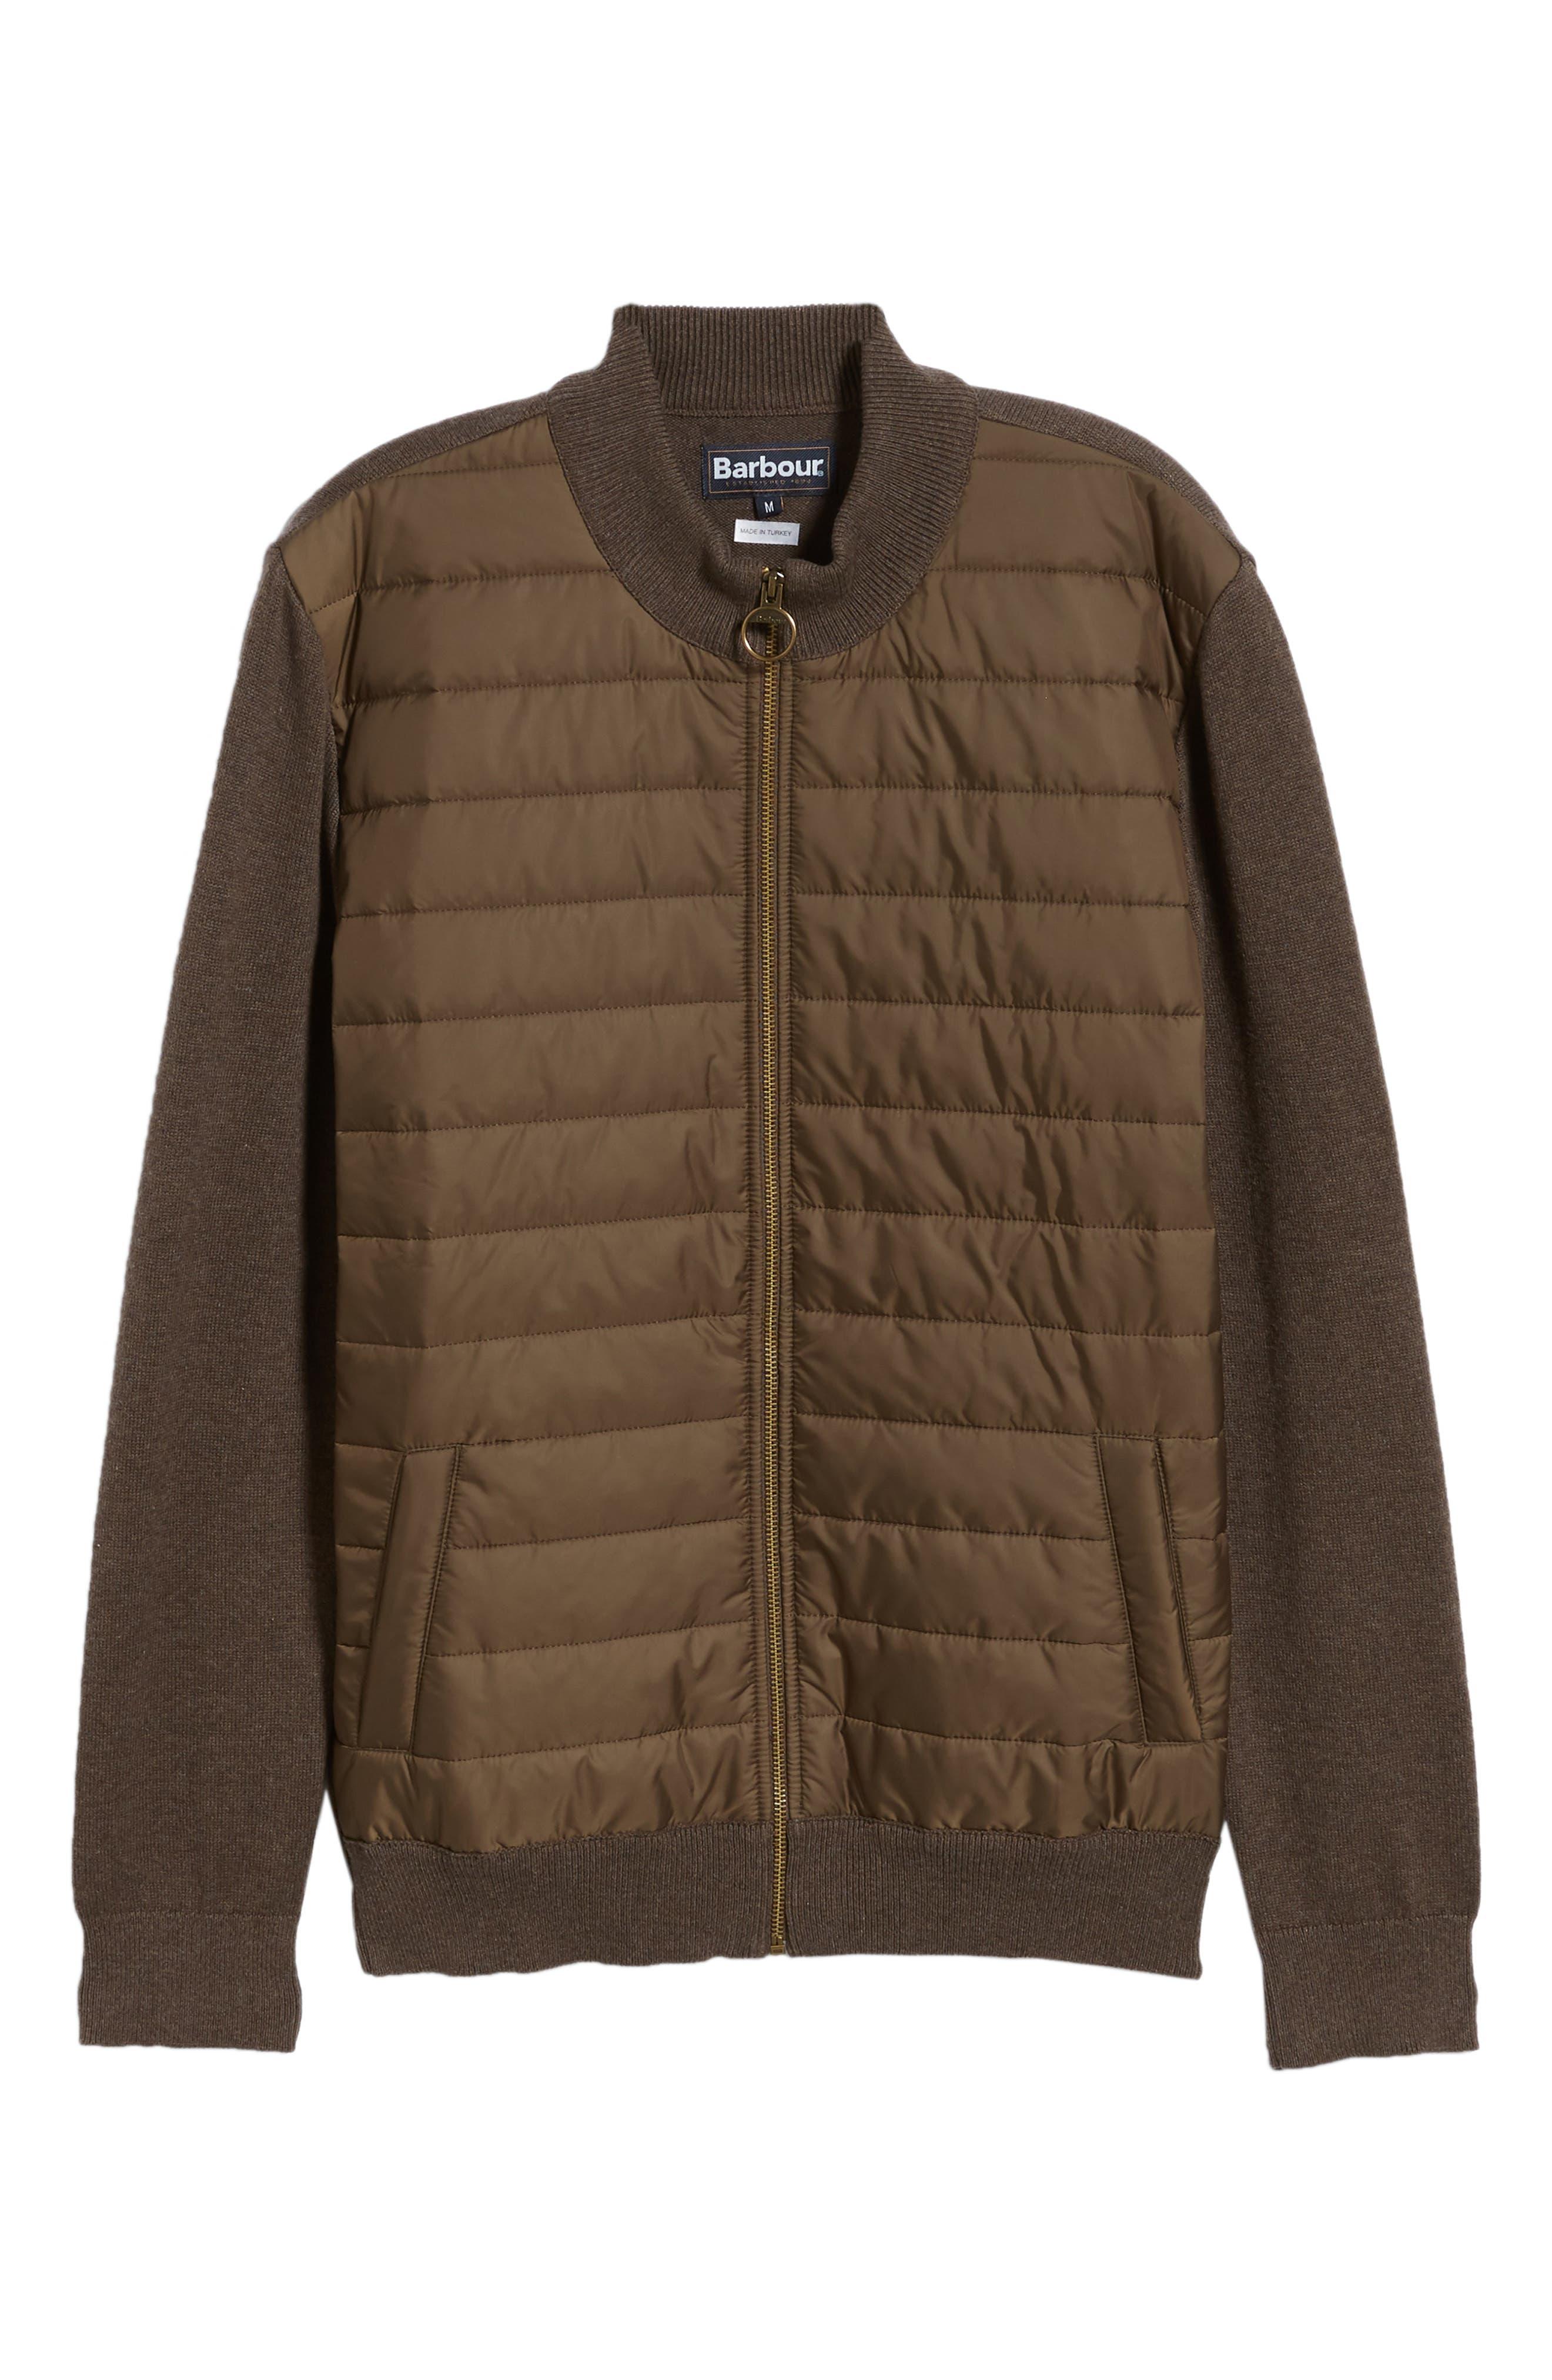 BARBOUR,                             Carn Baffle Front Knit Jacket,                             Alternate thumbnail 6, color,                             250